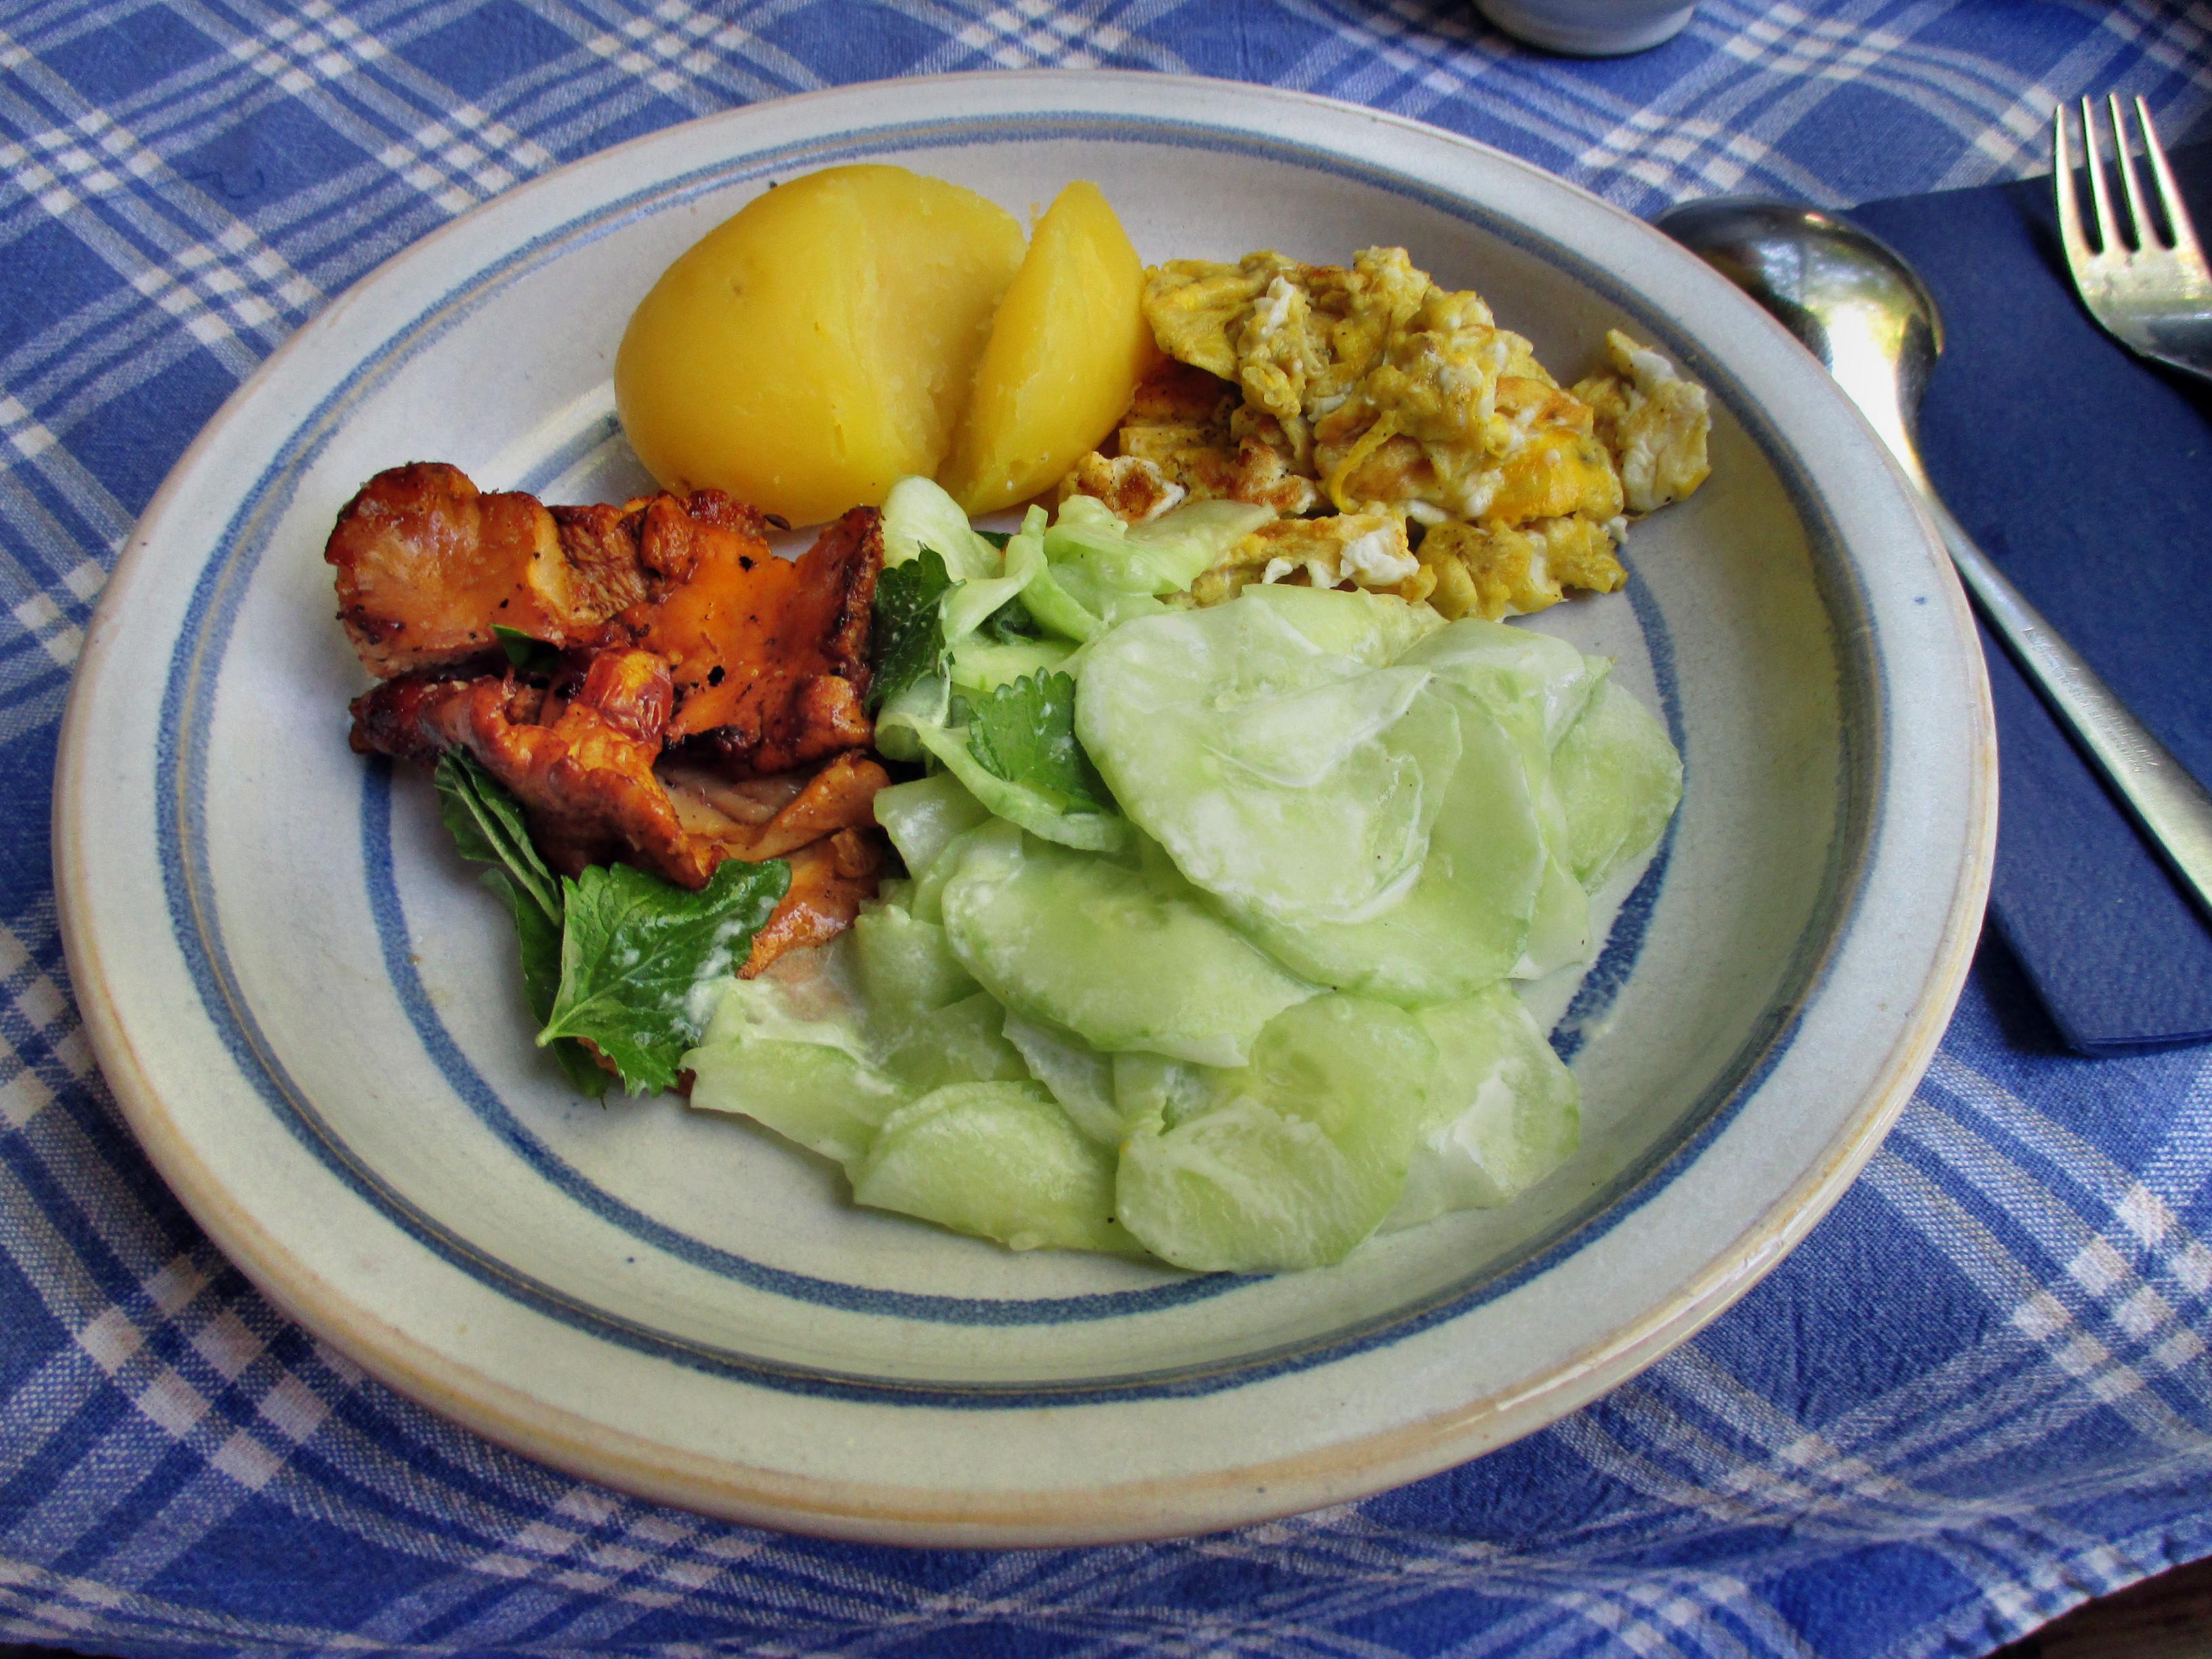 Pfifferlinge,Kartoffeln,Salat -2.7.15   (5)